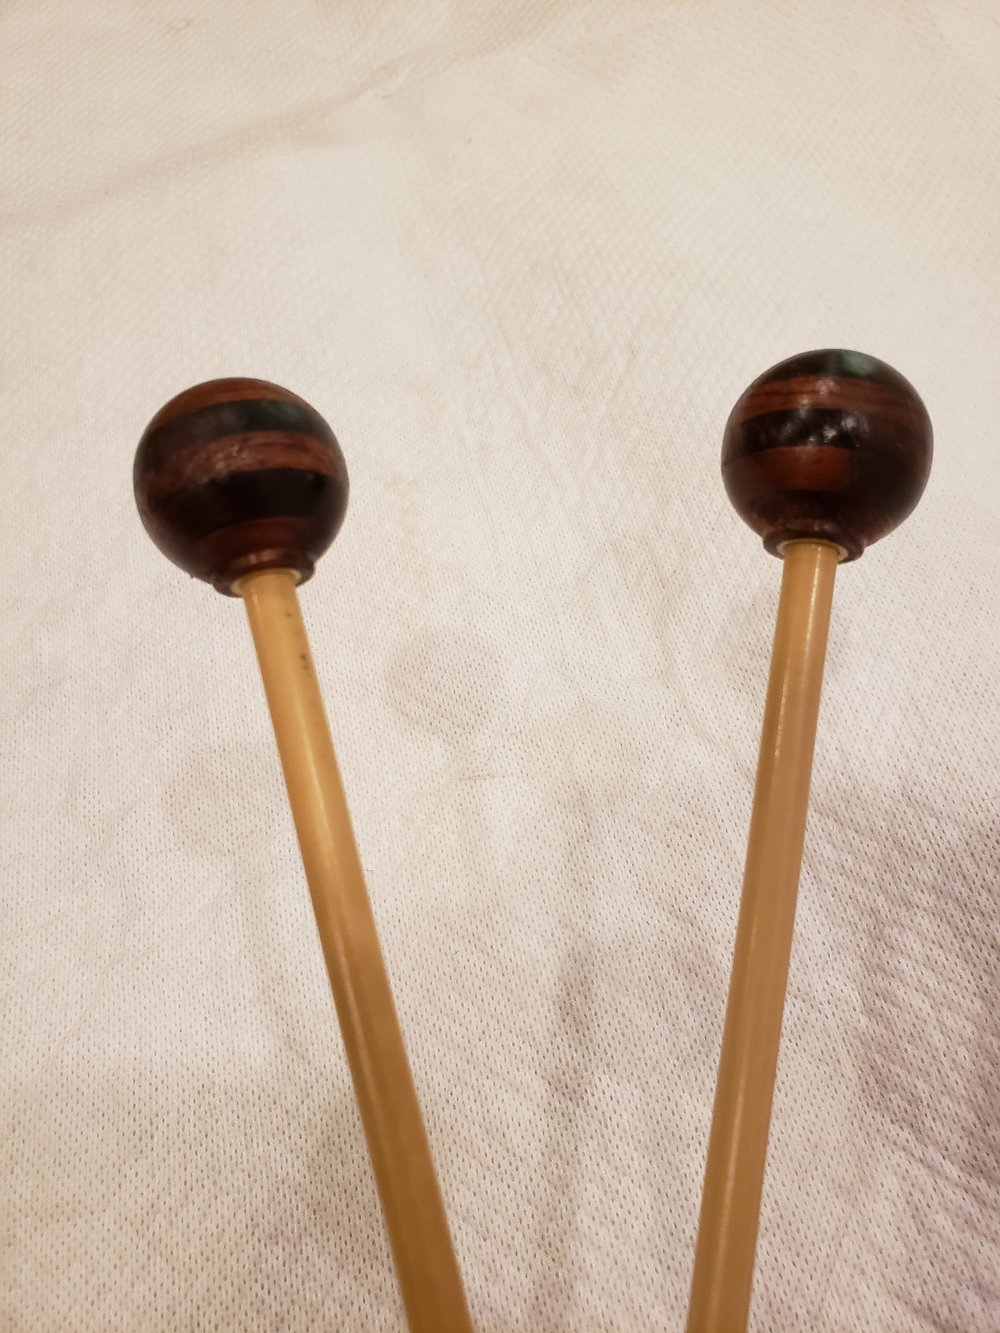 Rosewood mallets.jpg